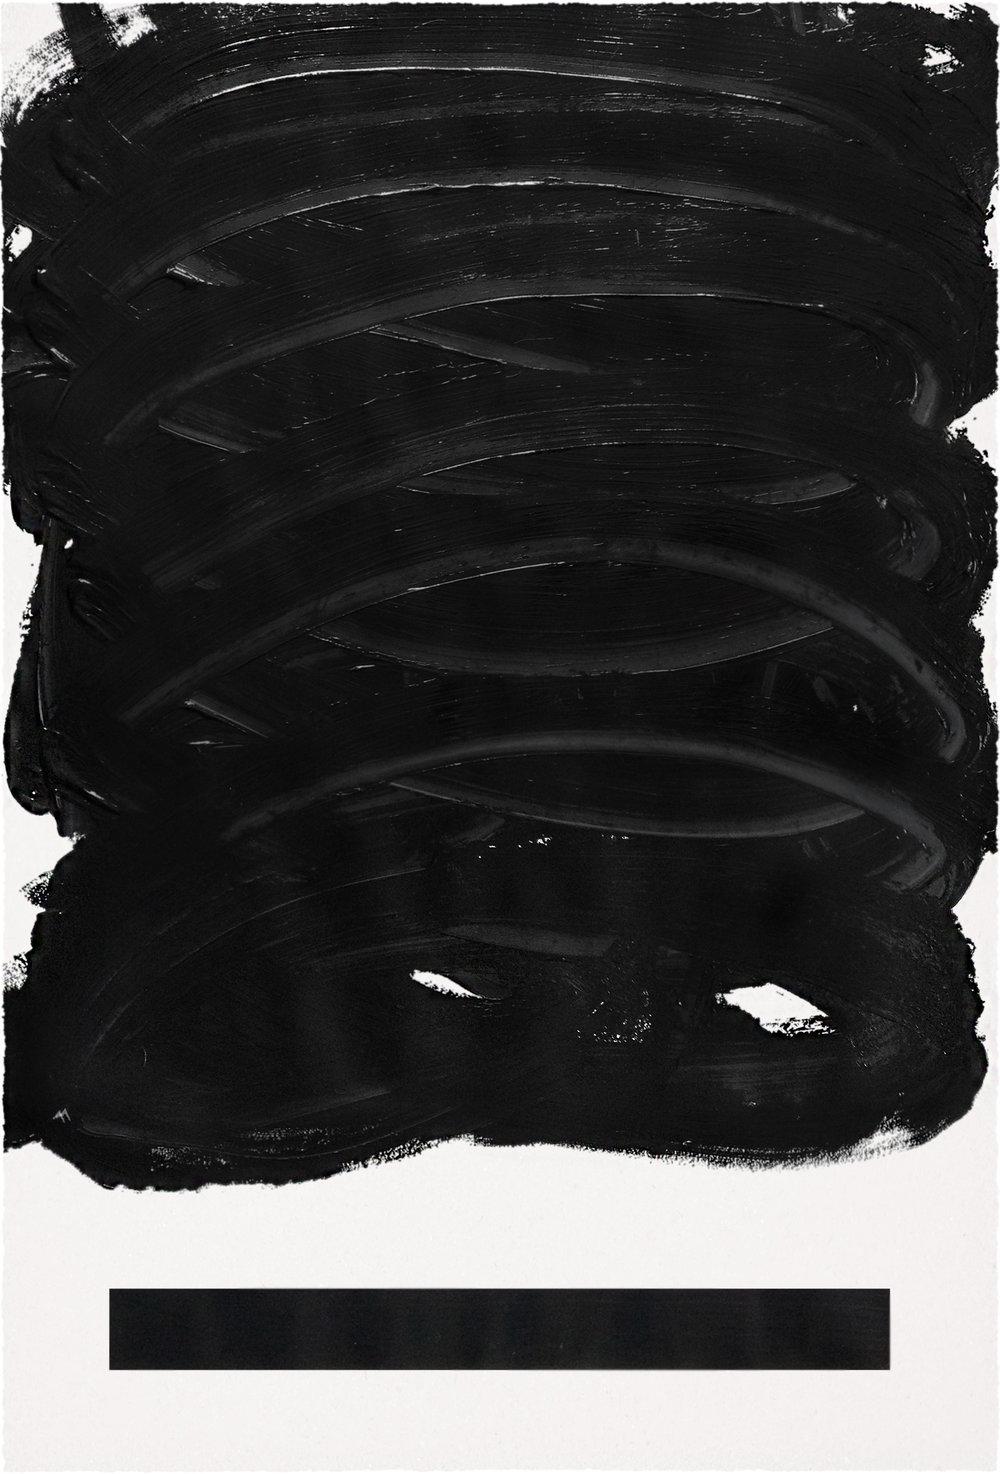 Two Black Lines, Diego Berjon